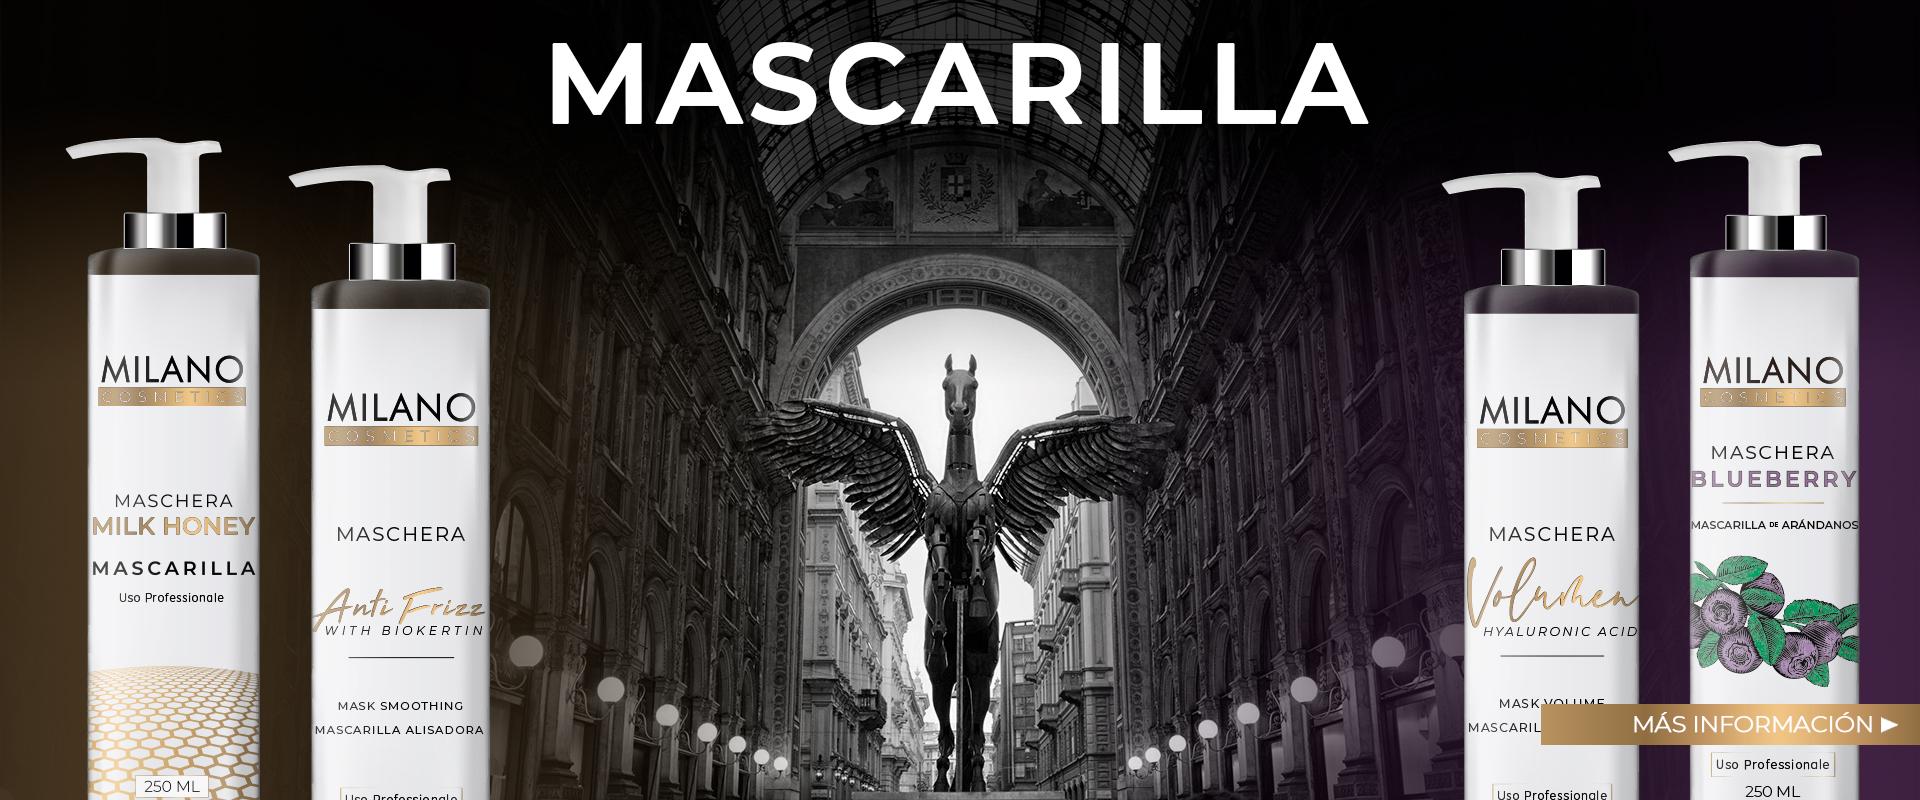 SLIDER 1920X800 MASCARILLAS-ES